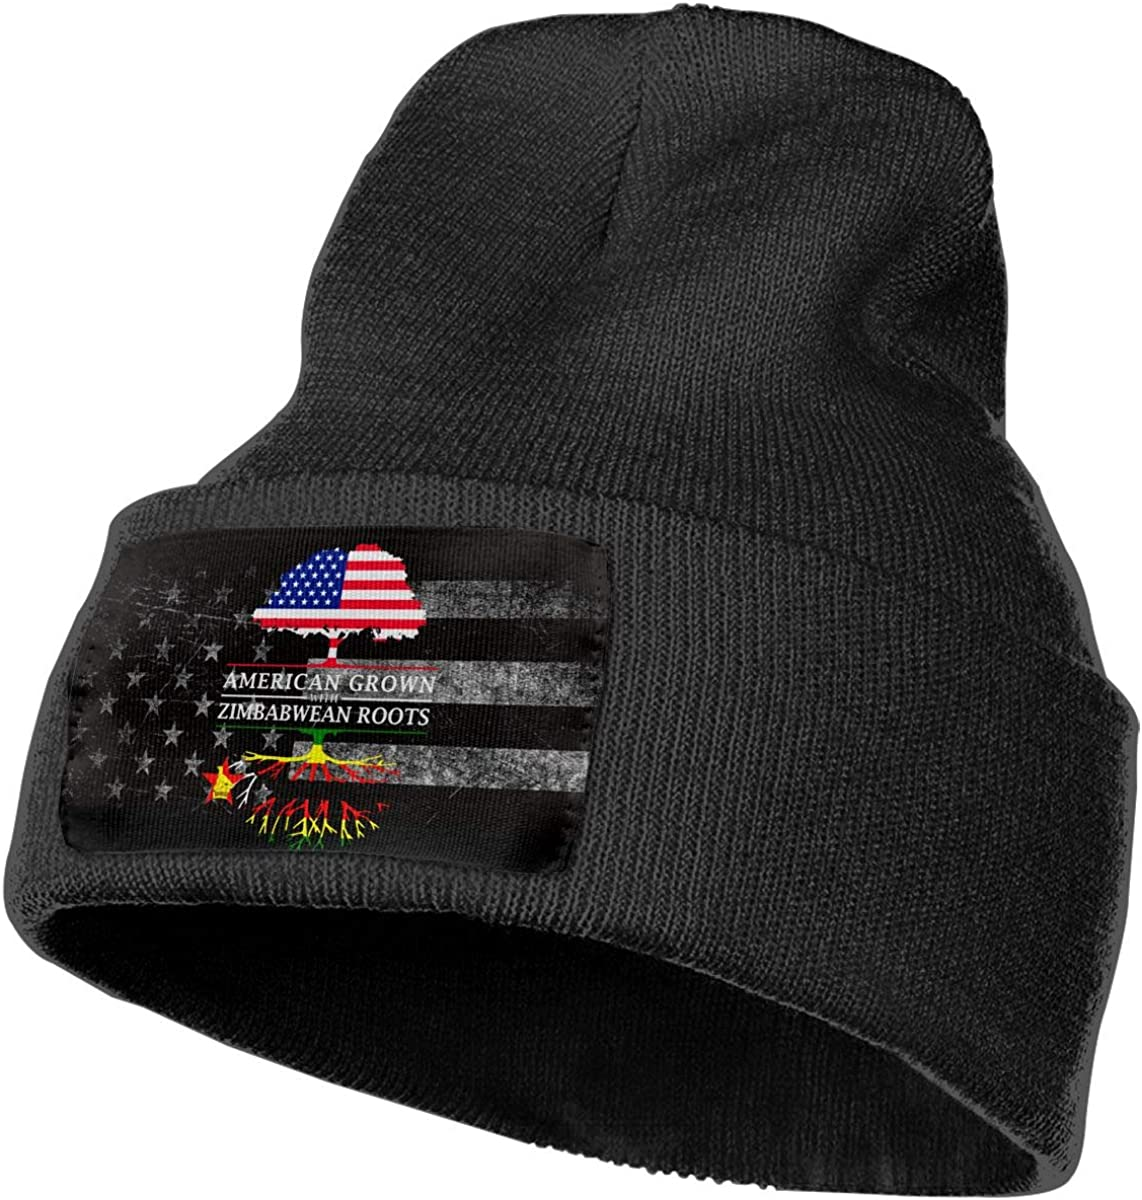 FORDSAN CP American Grown with Zimbabwean Roots Mens Beanie Cap Skull Cap Winter Warm Knitting Hats.